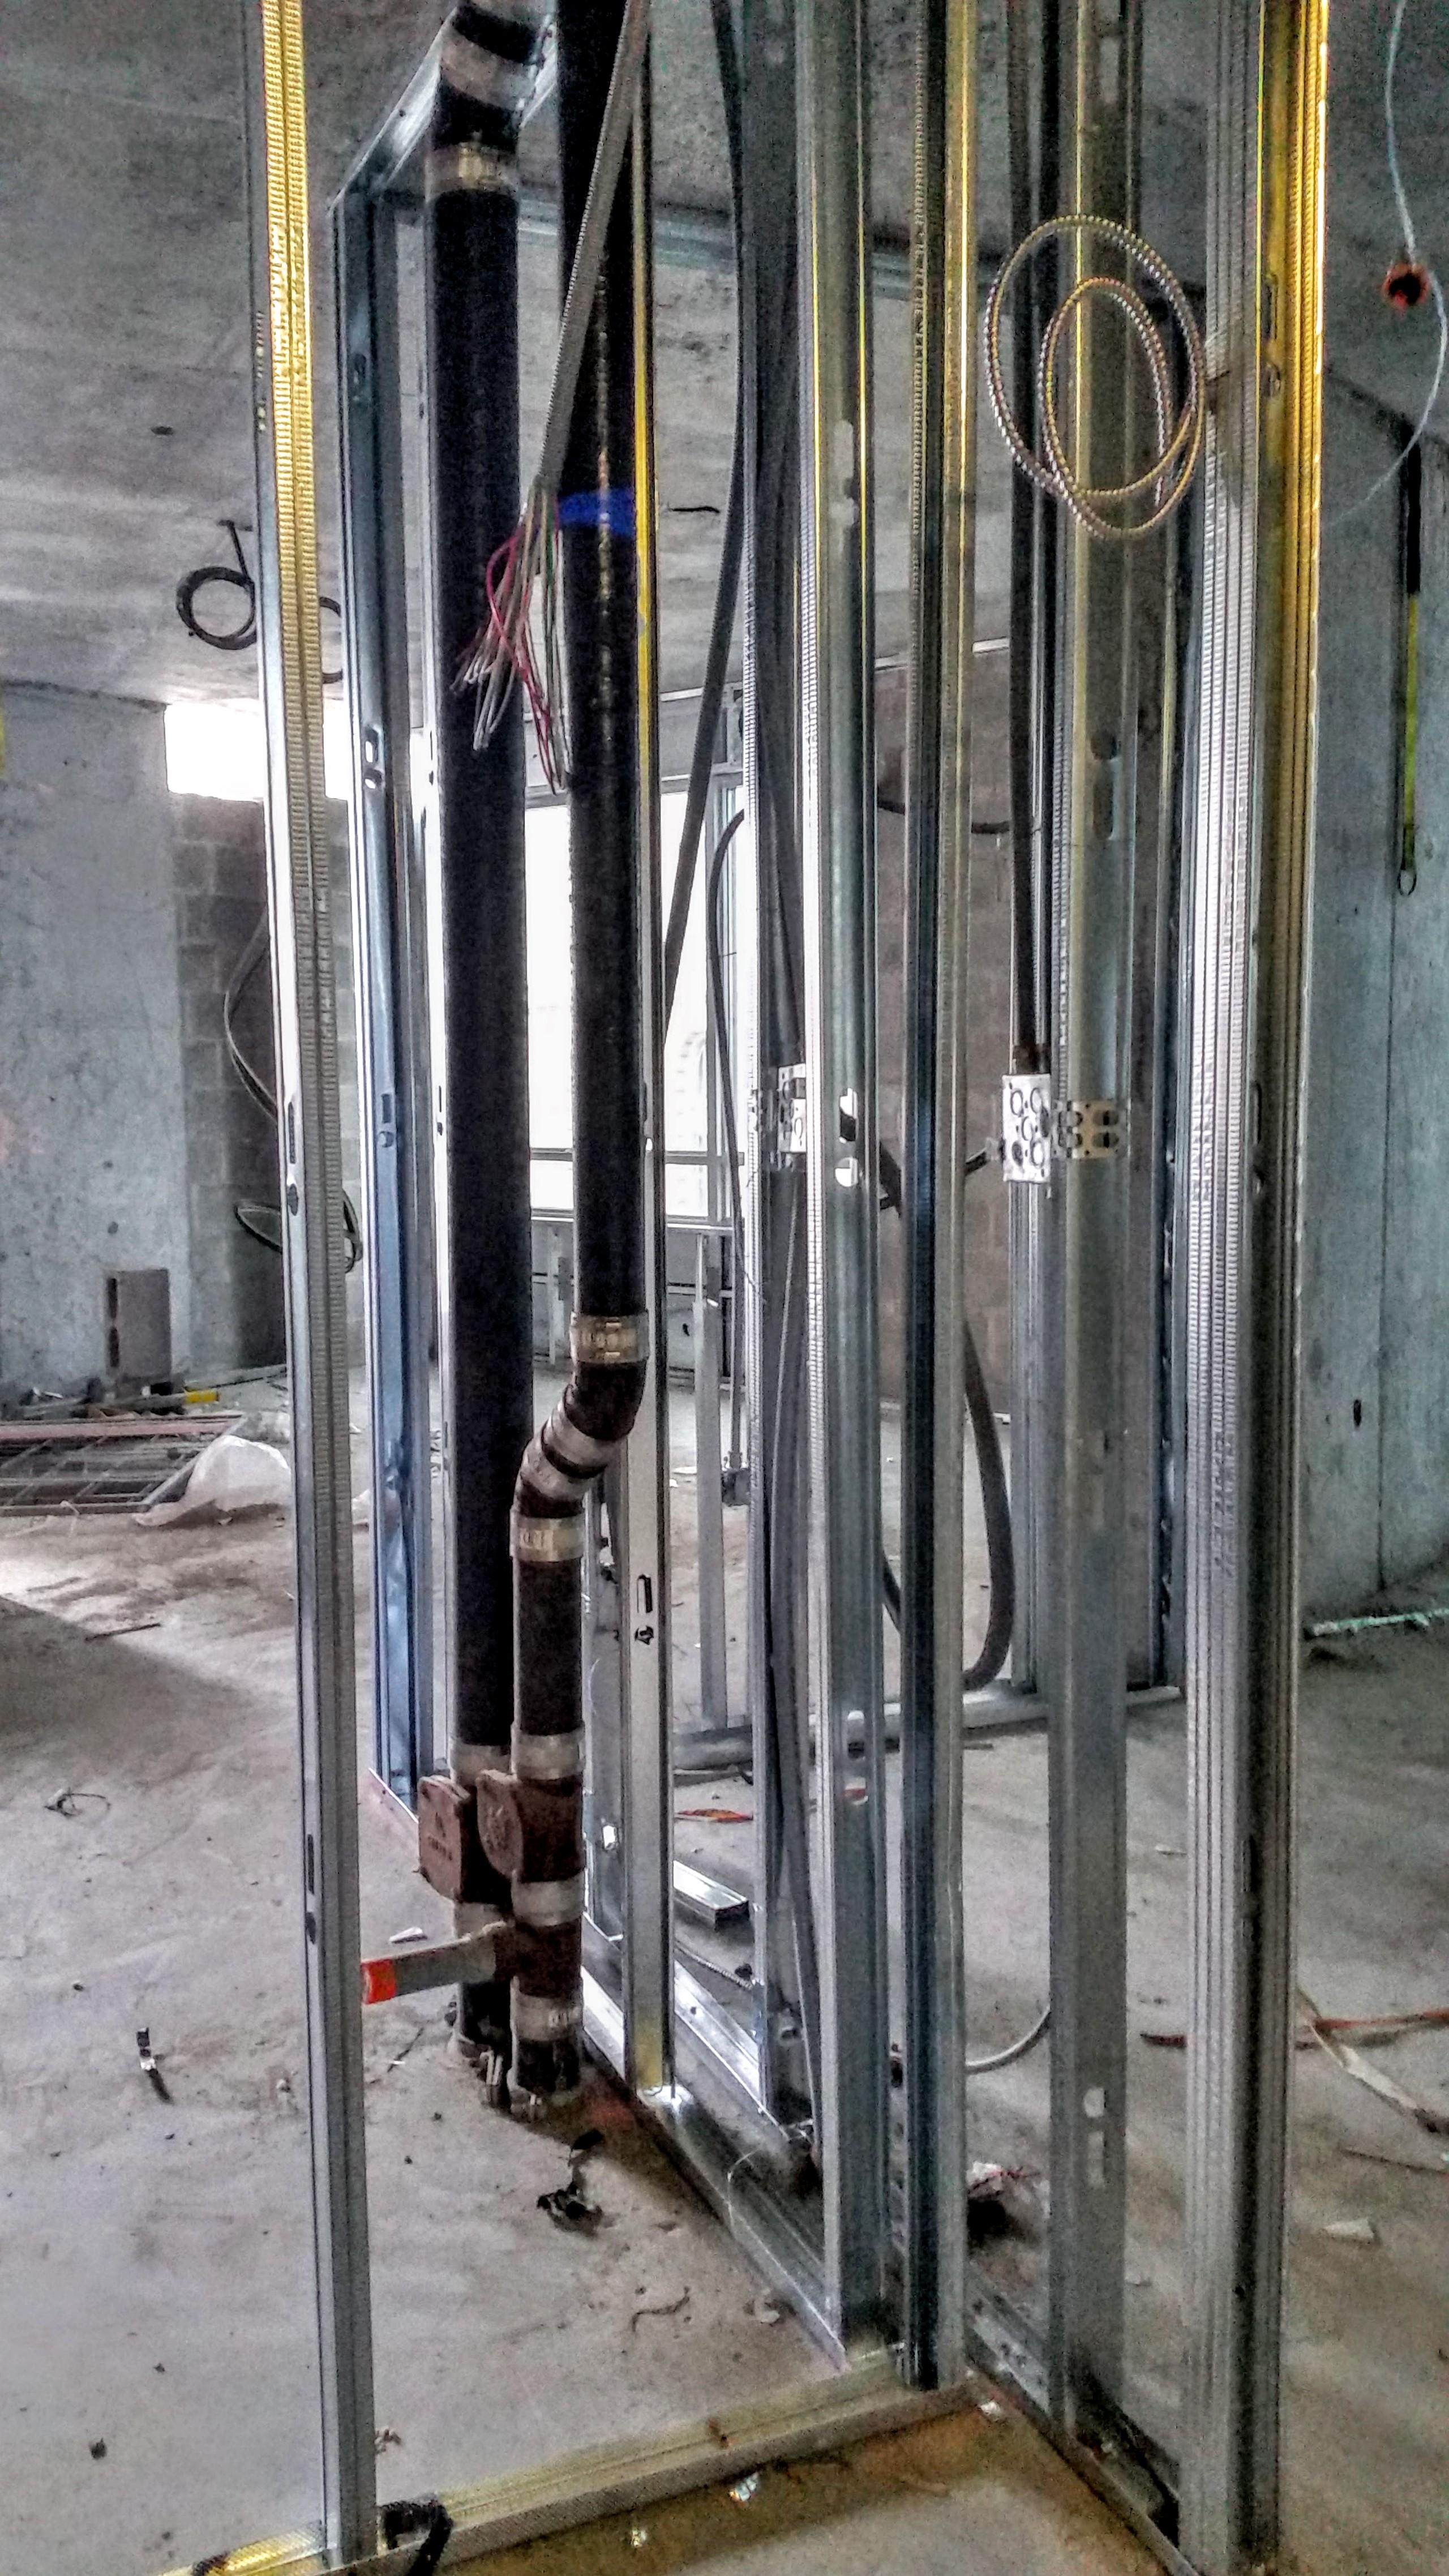 Dry Wall Construction : Asphalt work l tower backstage construction information